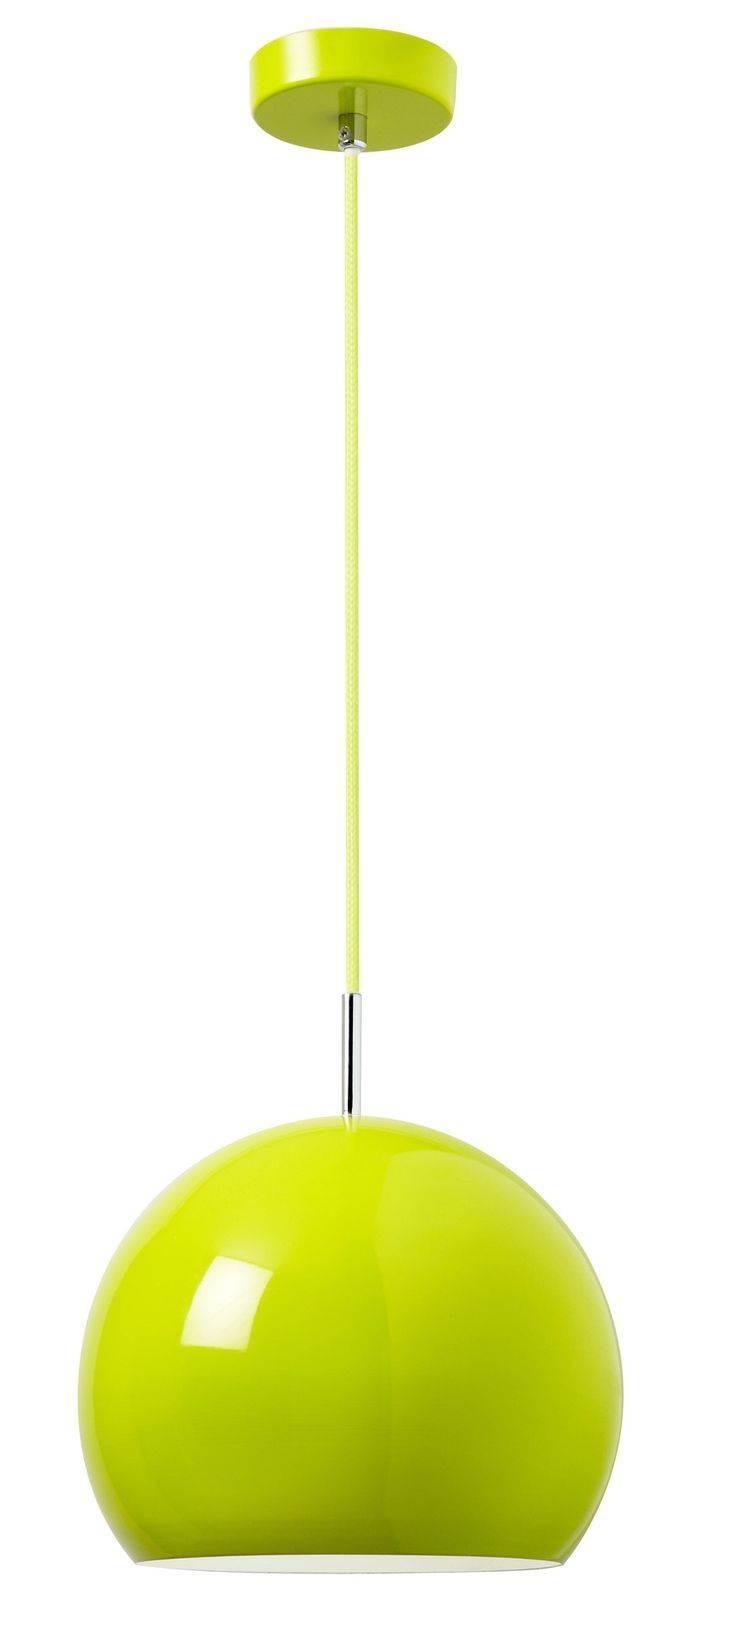 27 Best Kitchen Lights Images On Pinterest | Kitchen Lighting regarding Lime Green Pendant Lights (Image 1 of 15)